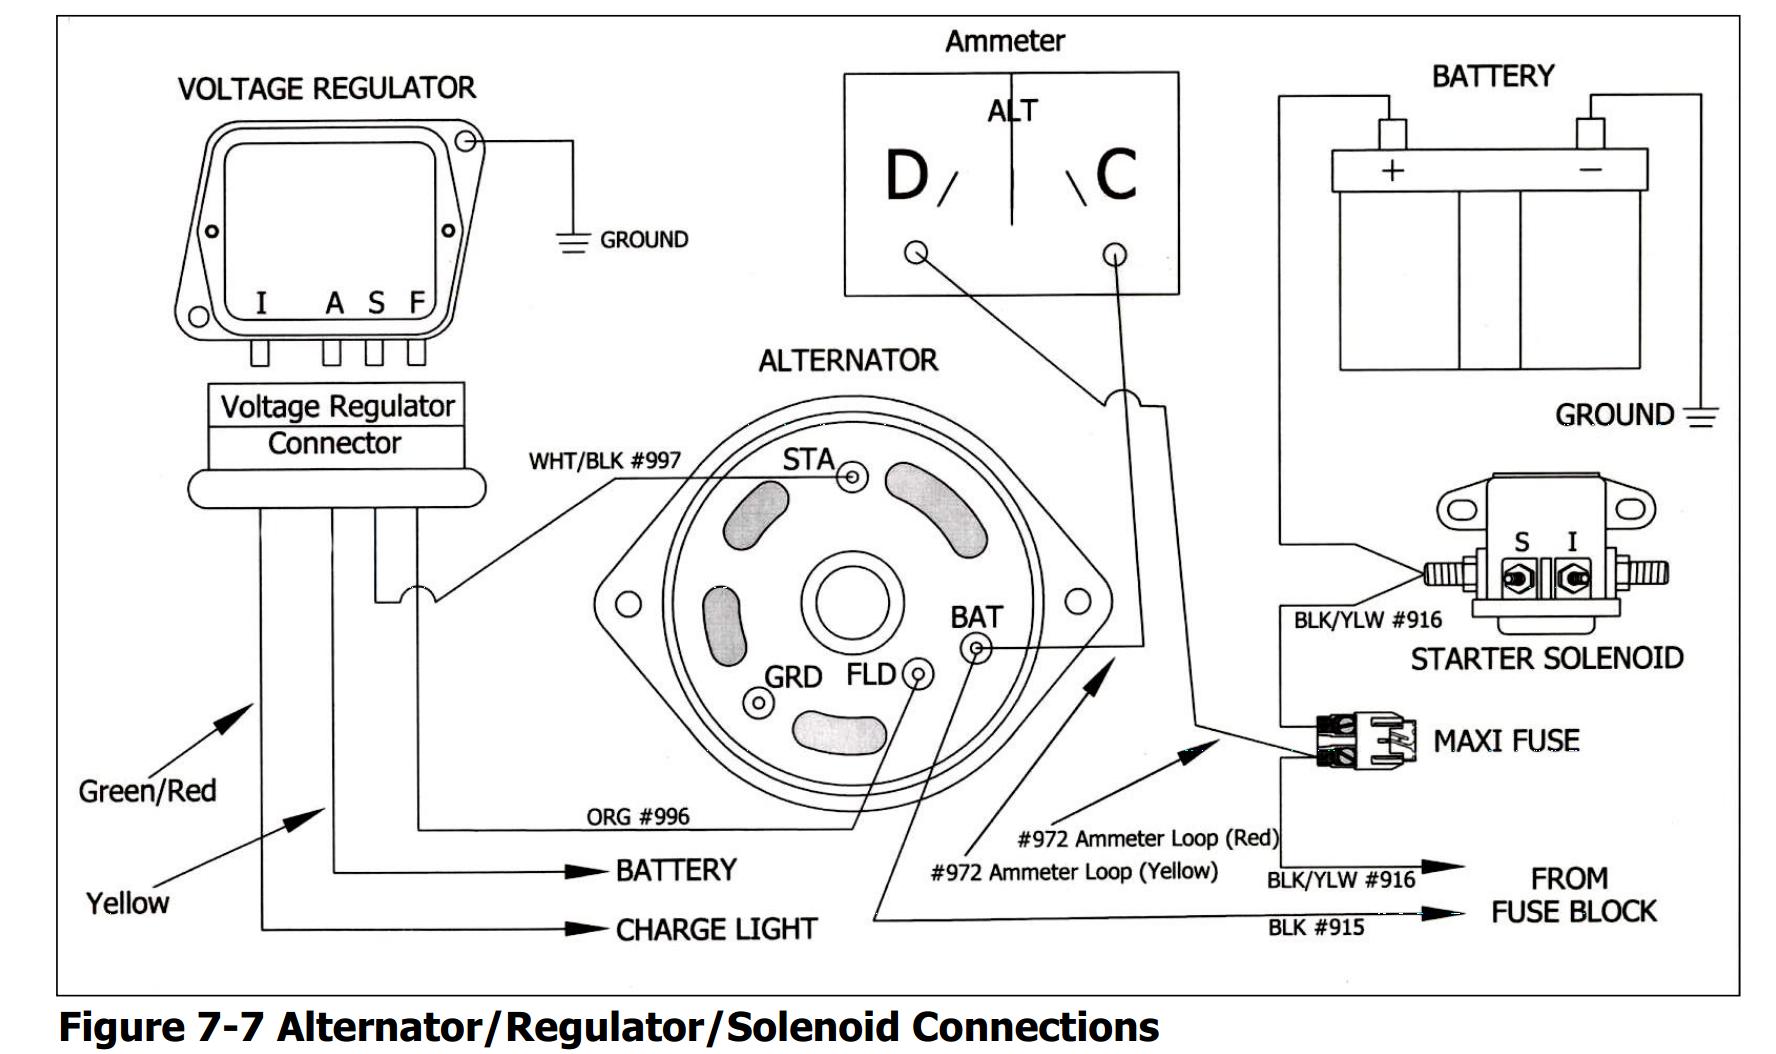 hight resolution of vr600 voltage regulator wiring diagram wiring libraryski doo voltage regulator diagram basic guide wiring diagram